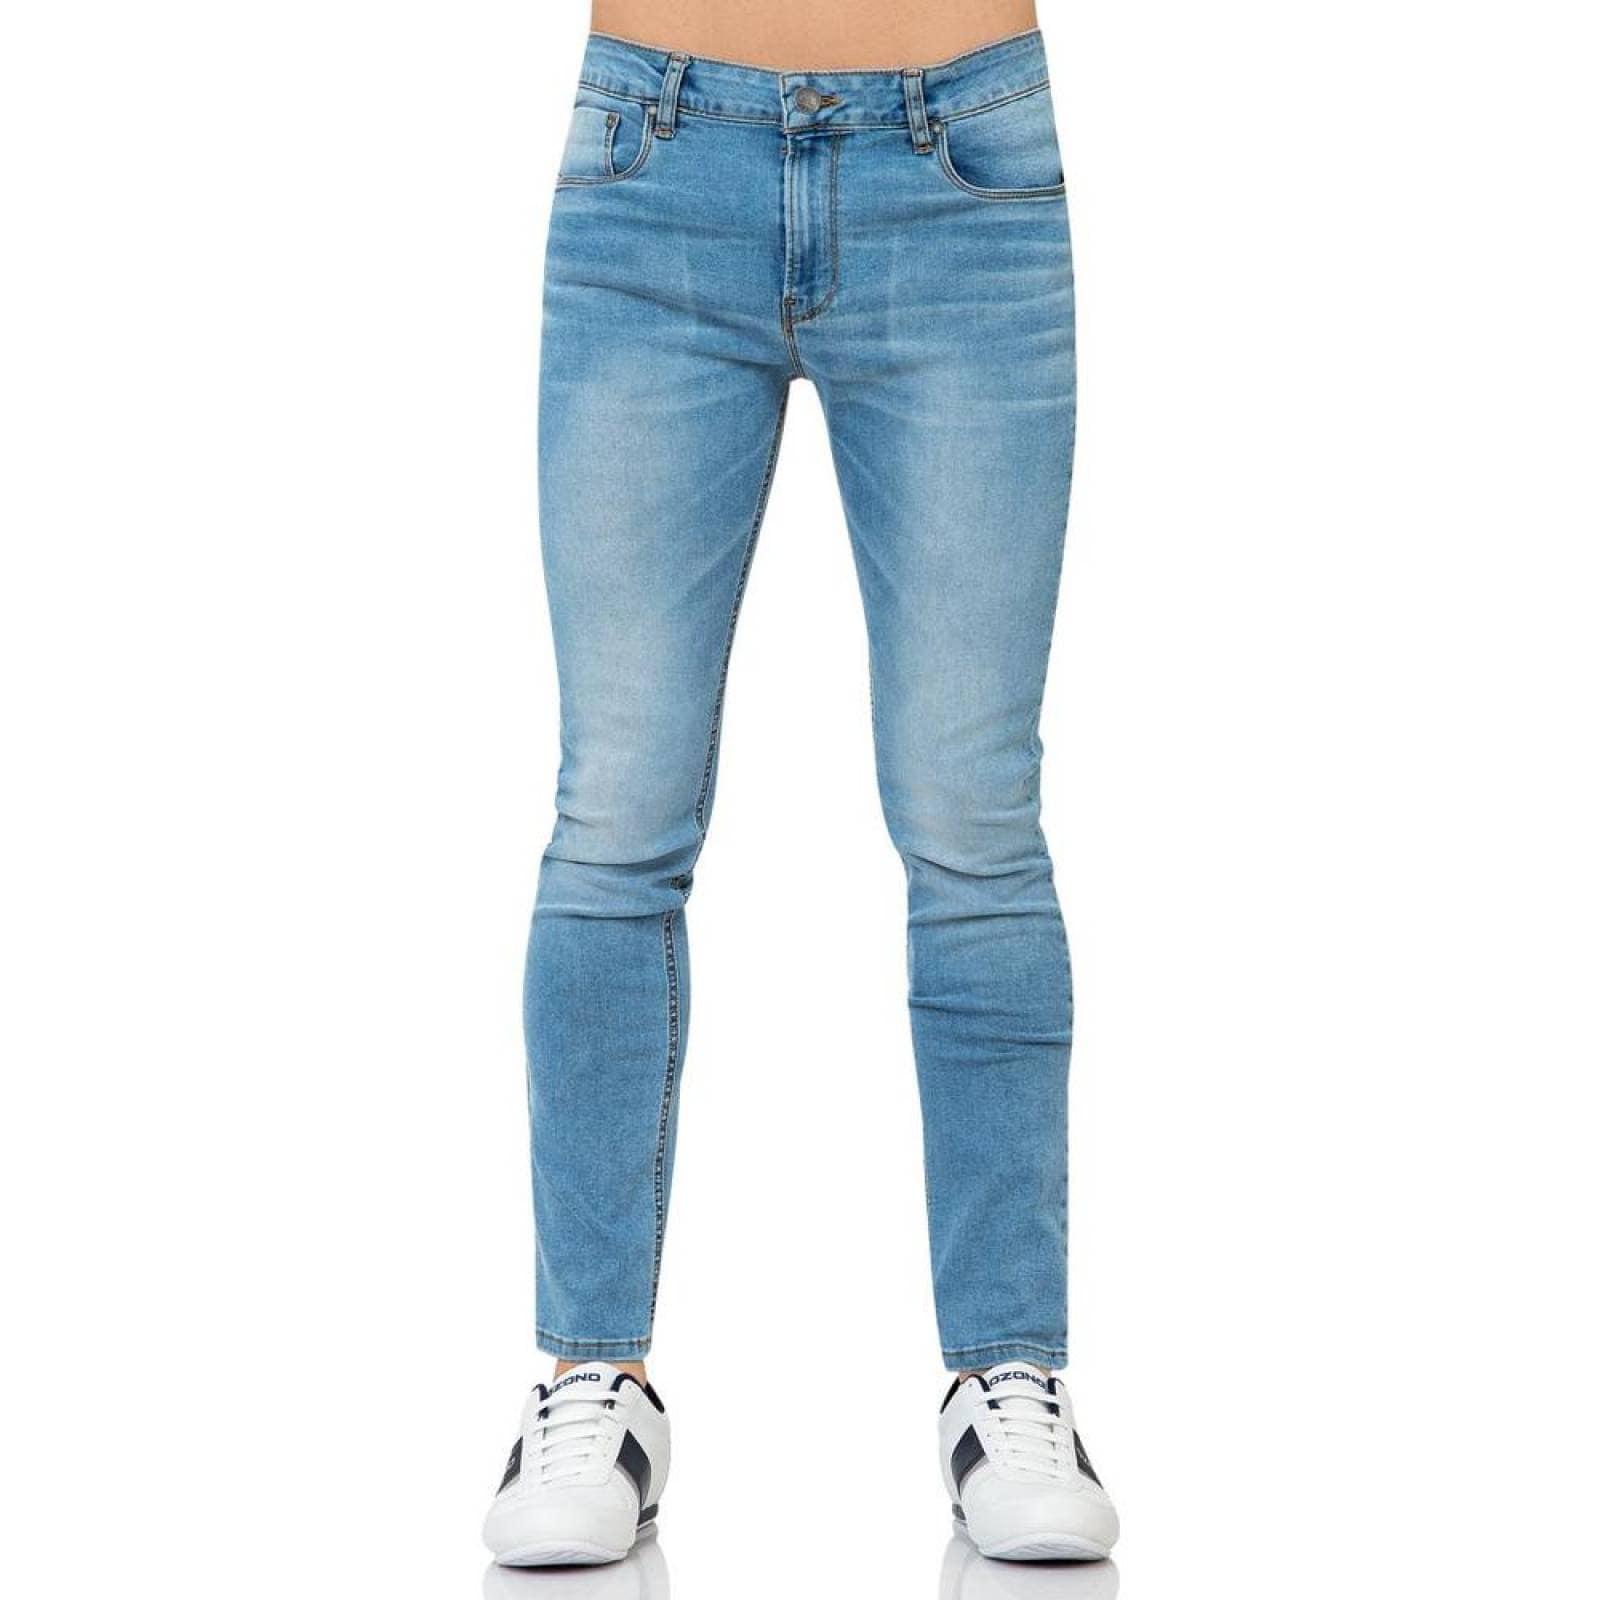 Jeans Furor Hombre 10103128 Bleach Mezclilla Stretch Rolling